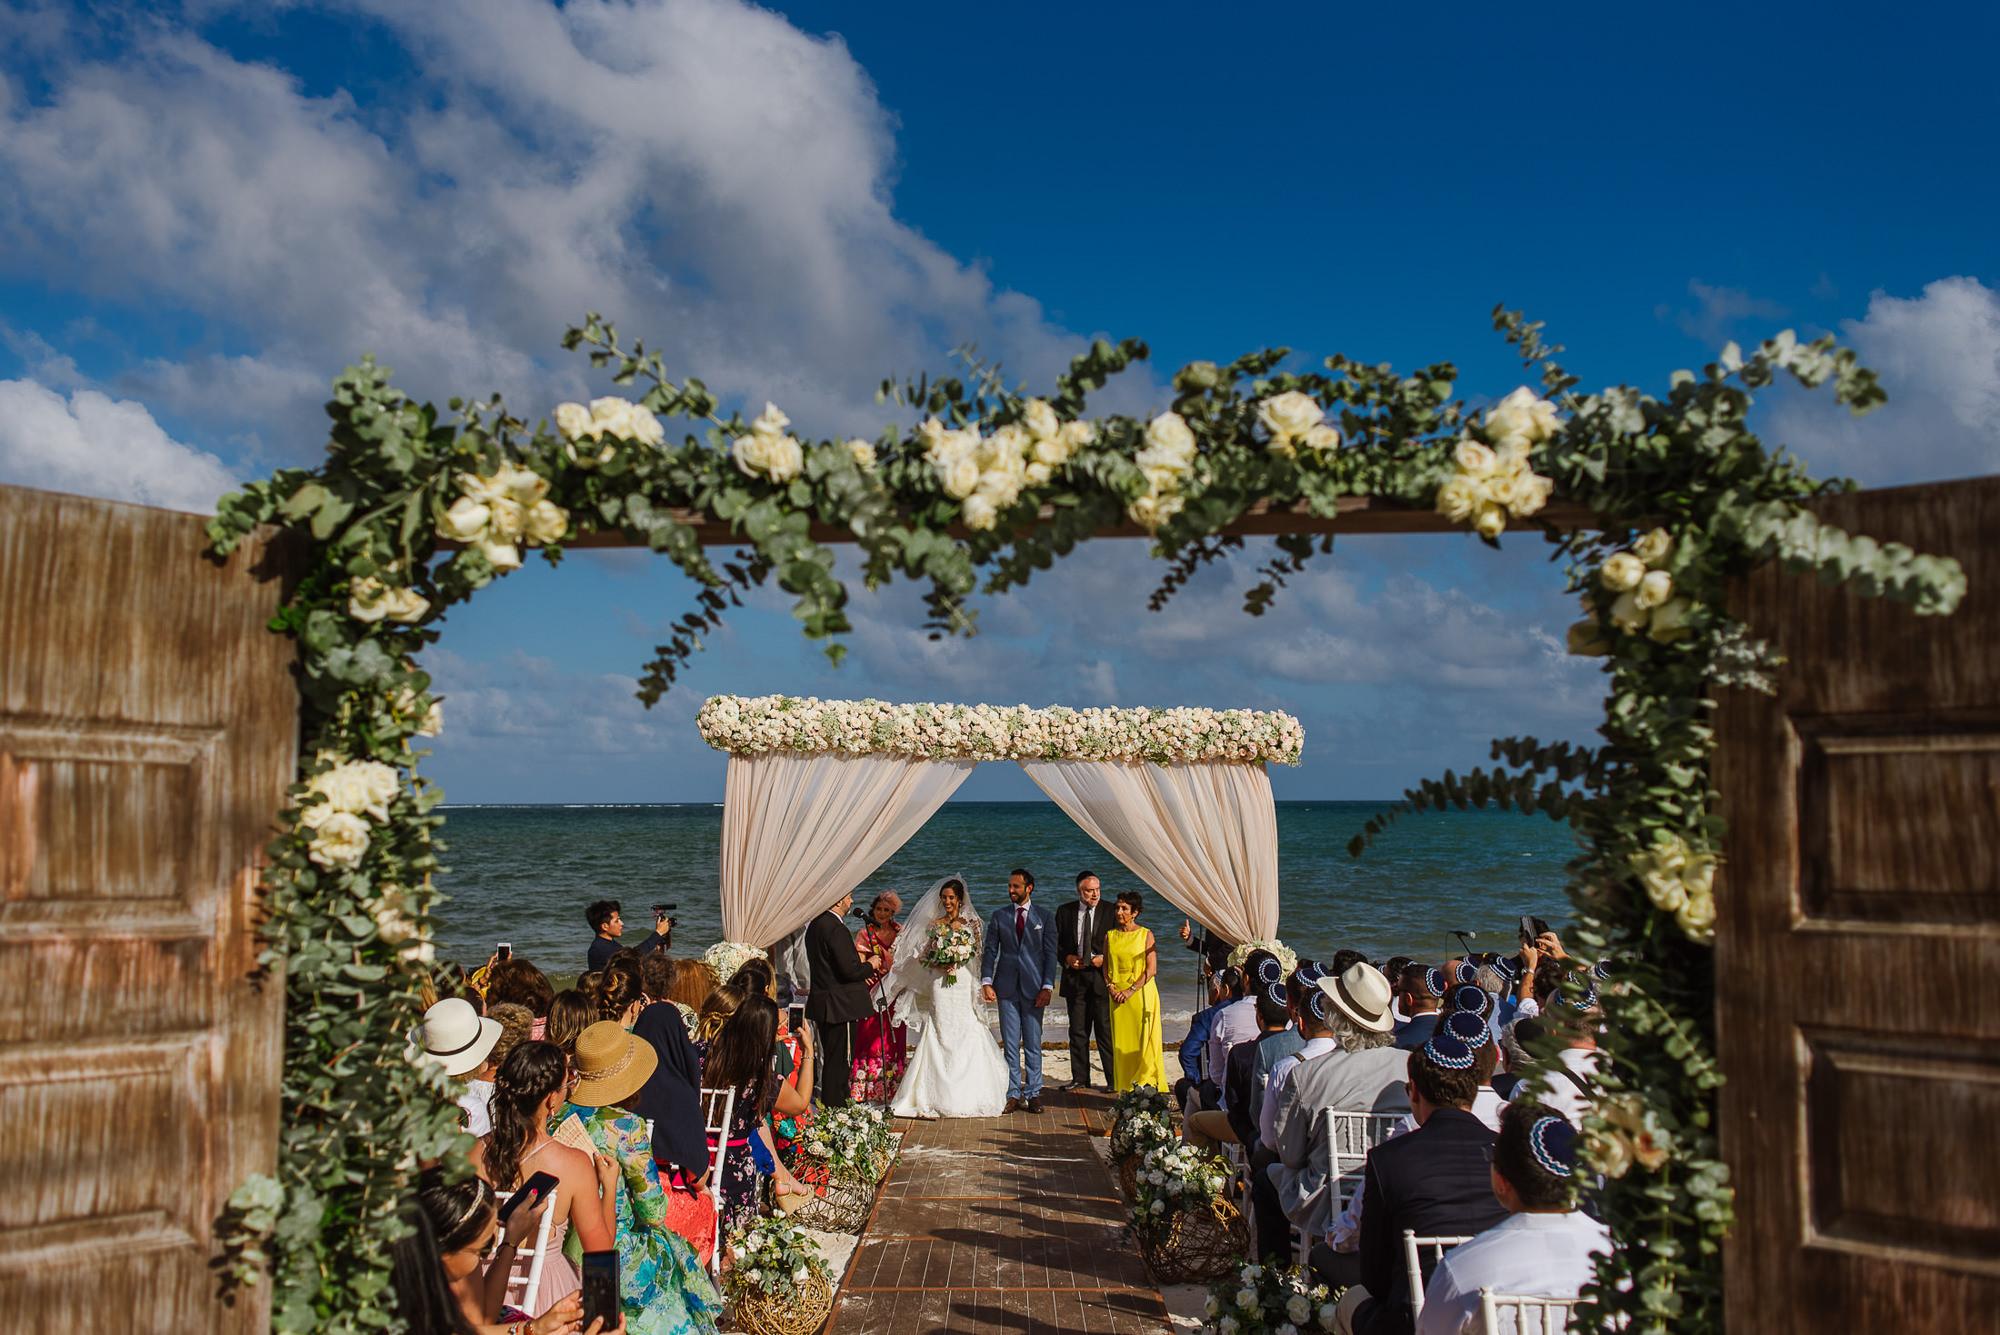 beach-wedding-ceremony-white-and-green-worlds-best-wedding-photos-citlalli-rico-mexico-wedding-photographers